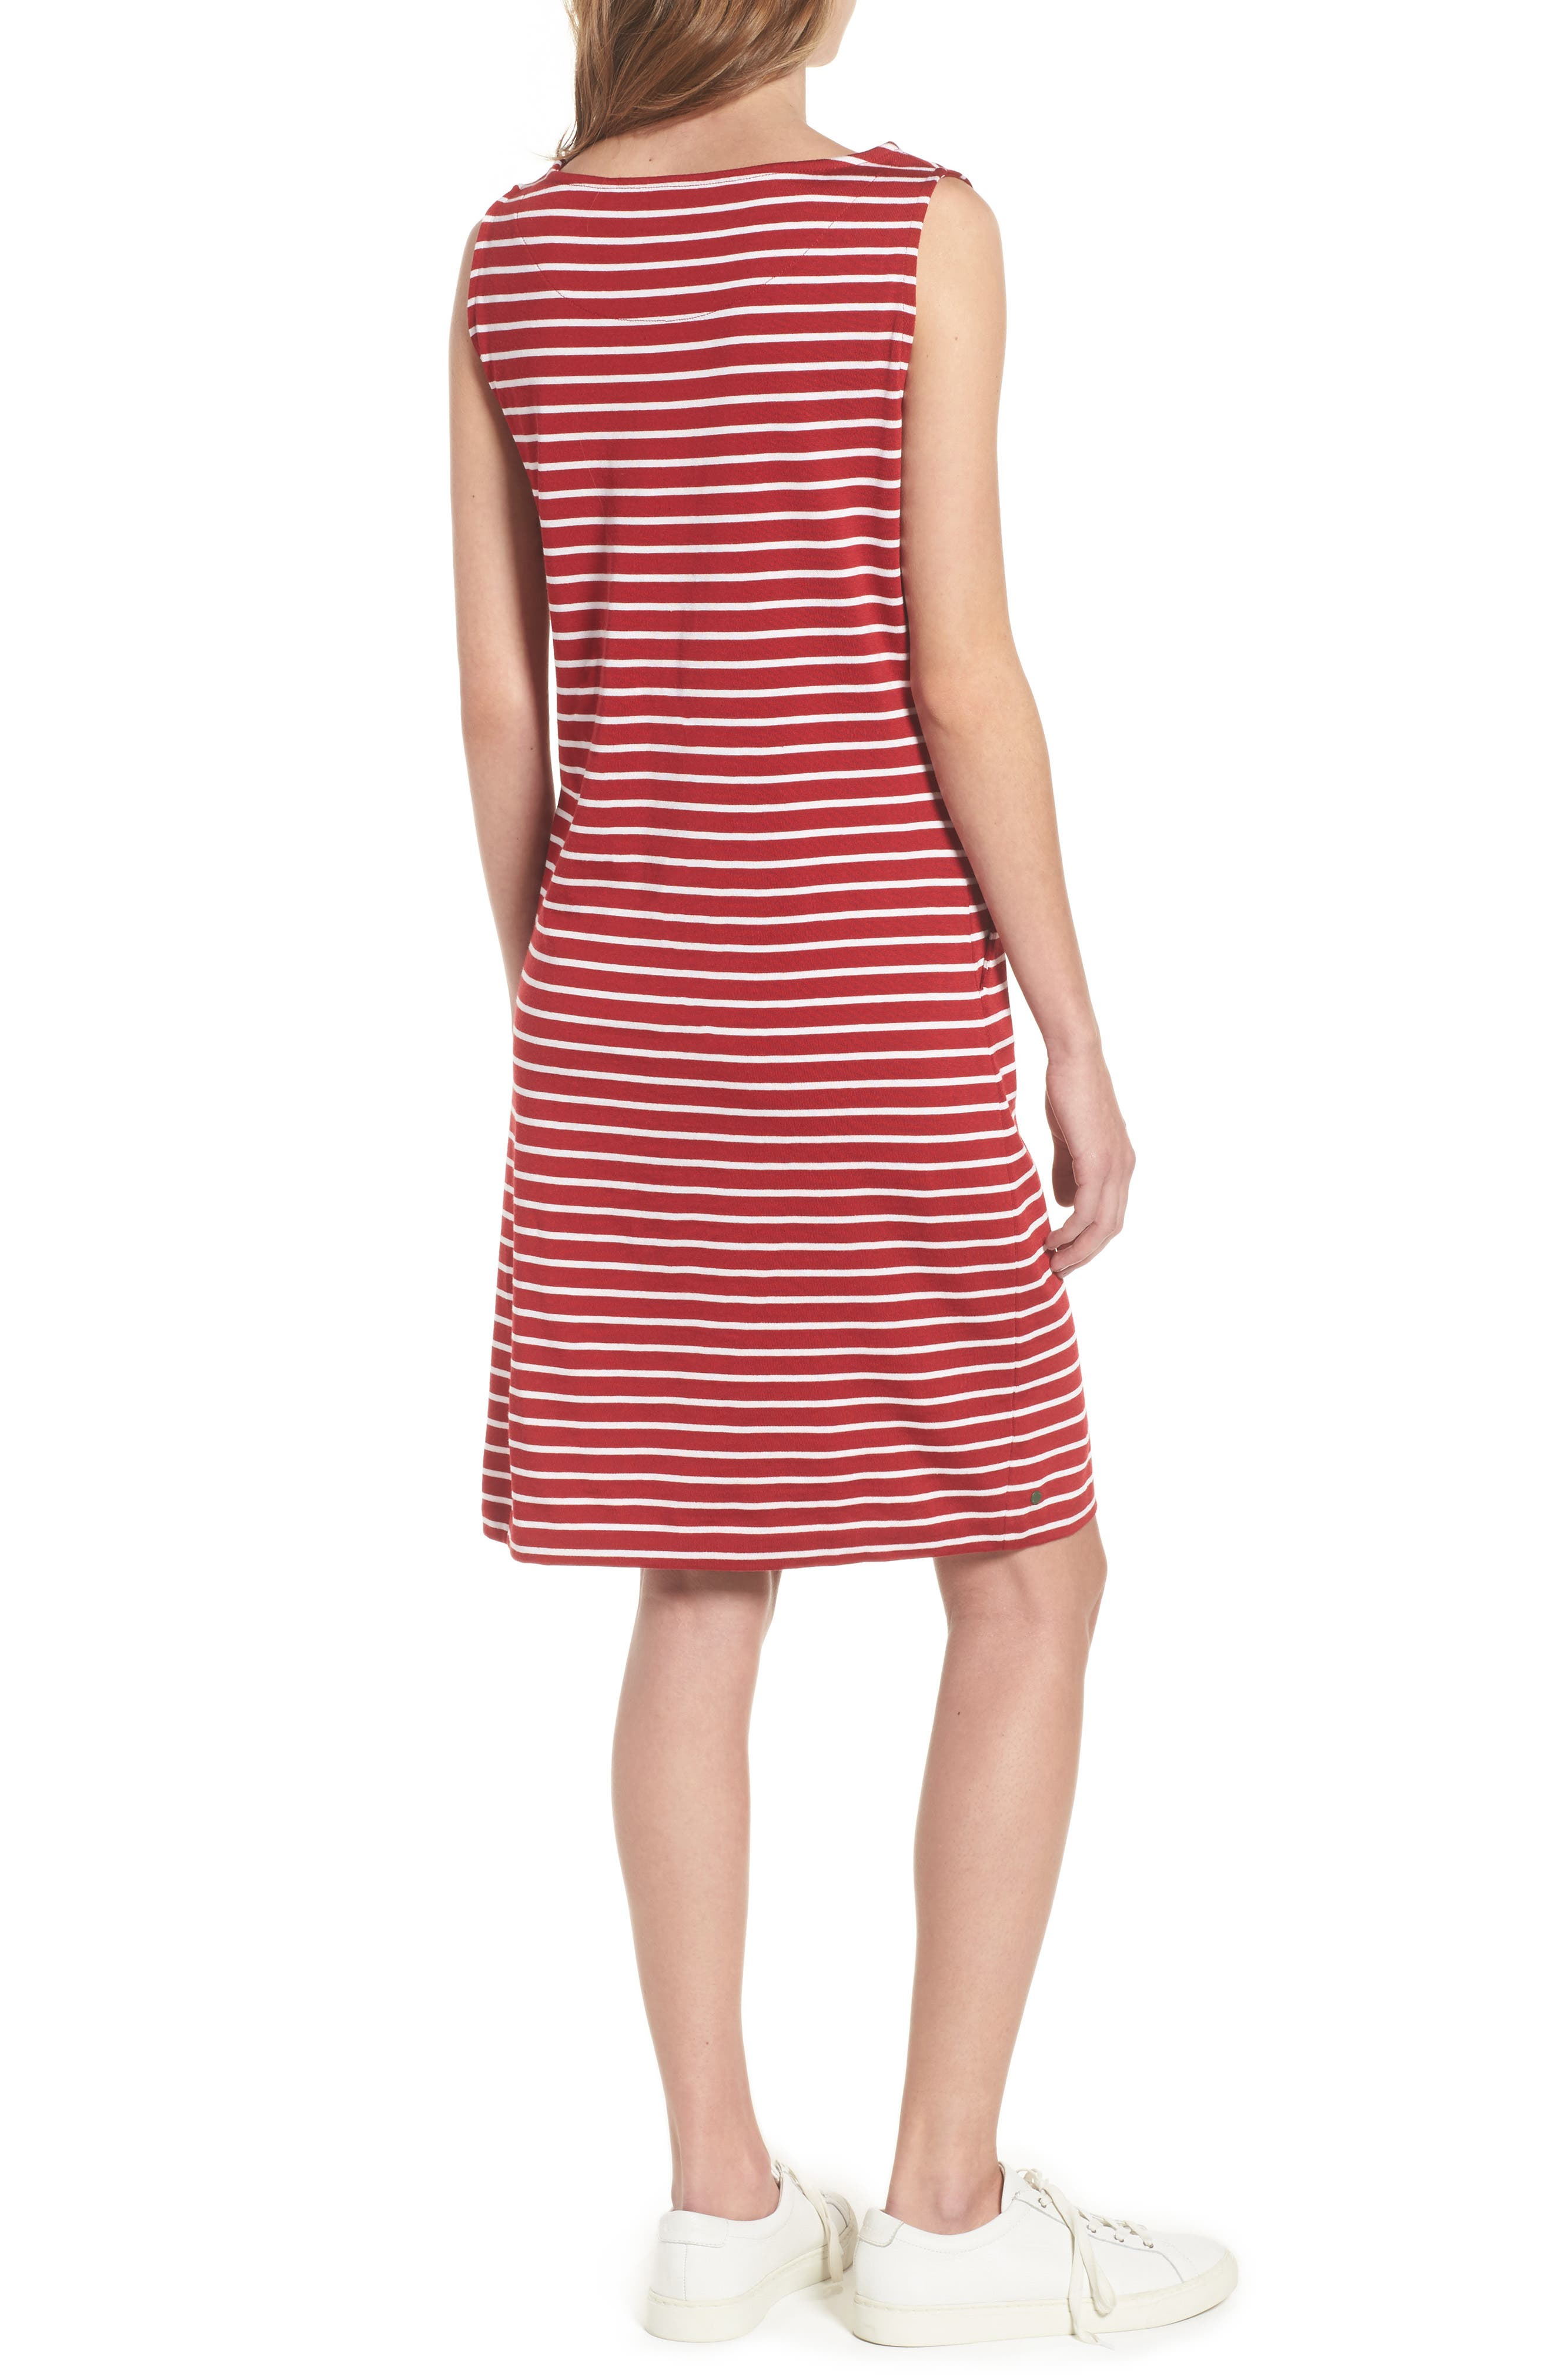 Dalmore Stripe Jersey Sleeveless Shift Dress,                             Alternate thumbnail 2, color,                             630